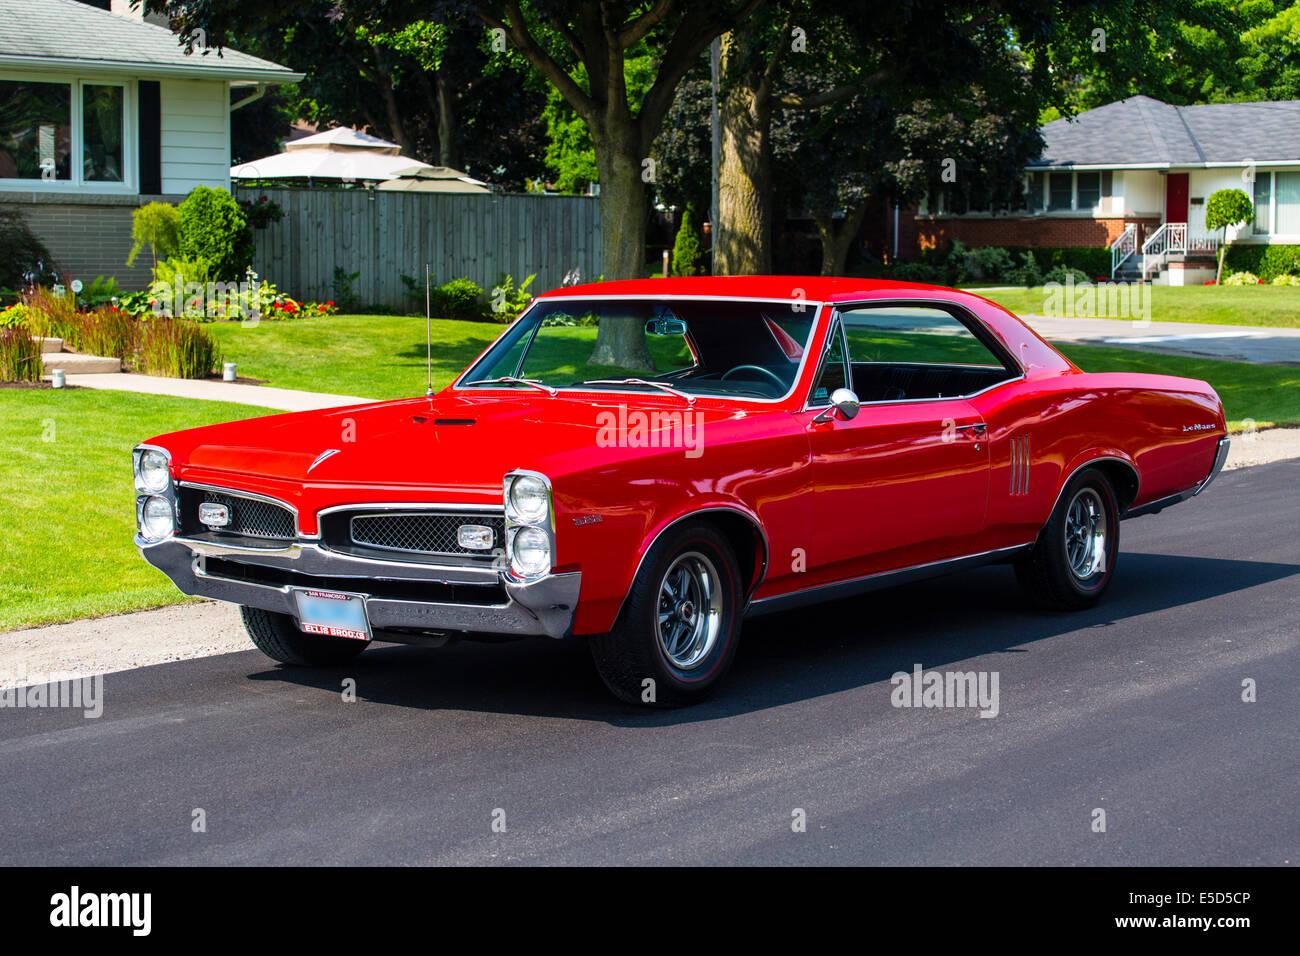 1967 Pontiac Lemans Coupe Stock Photo